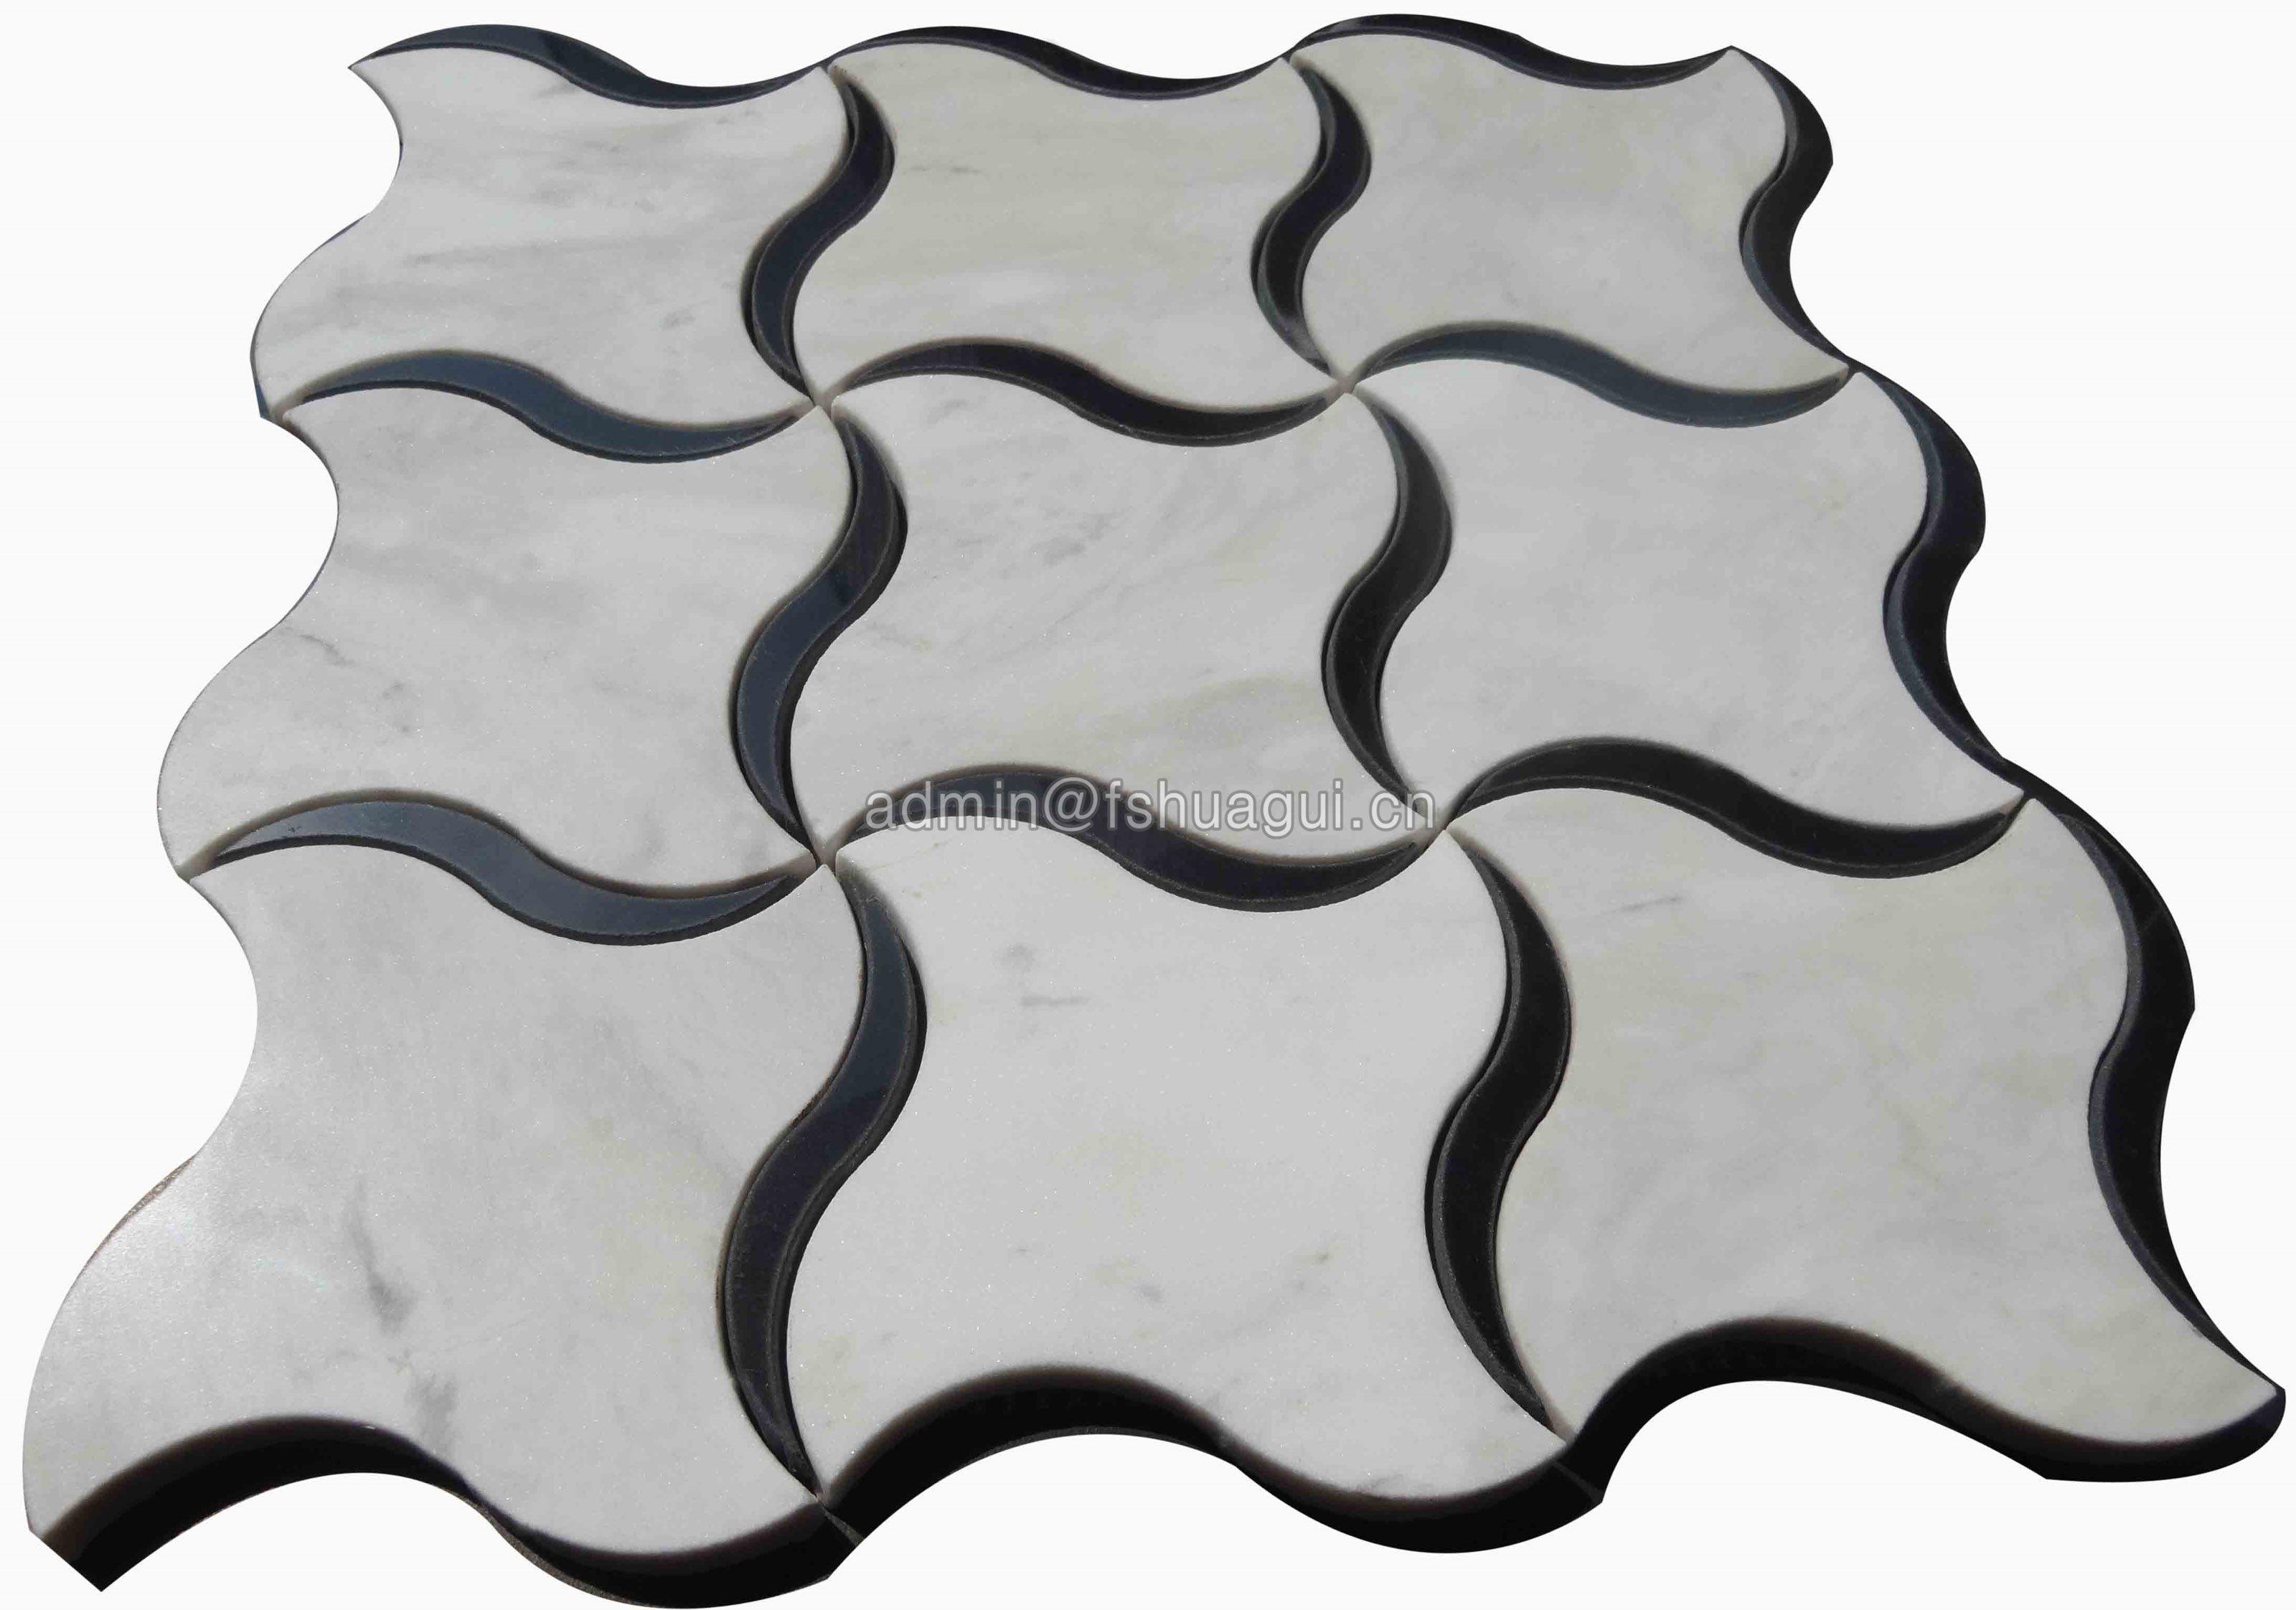 Huagui Water jet Stone Mosaic HG-WJ001 STONE MOSAIC TILE image5